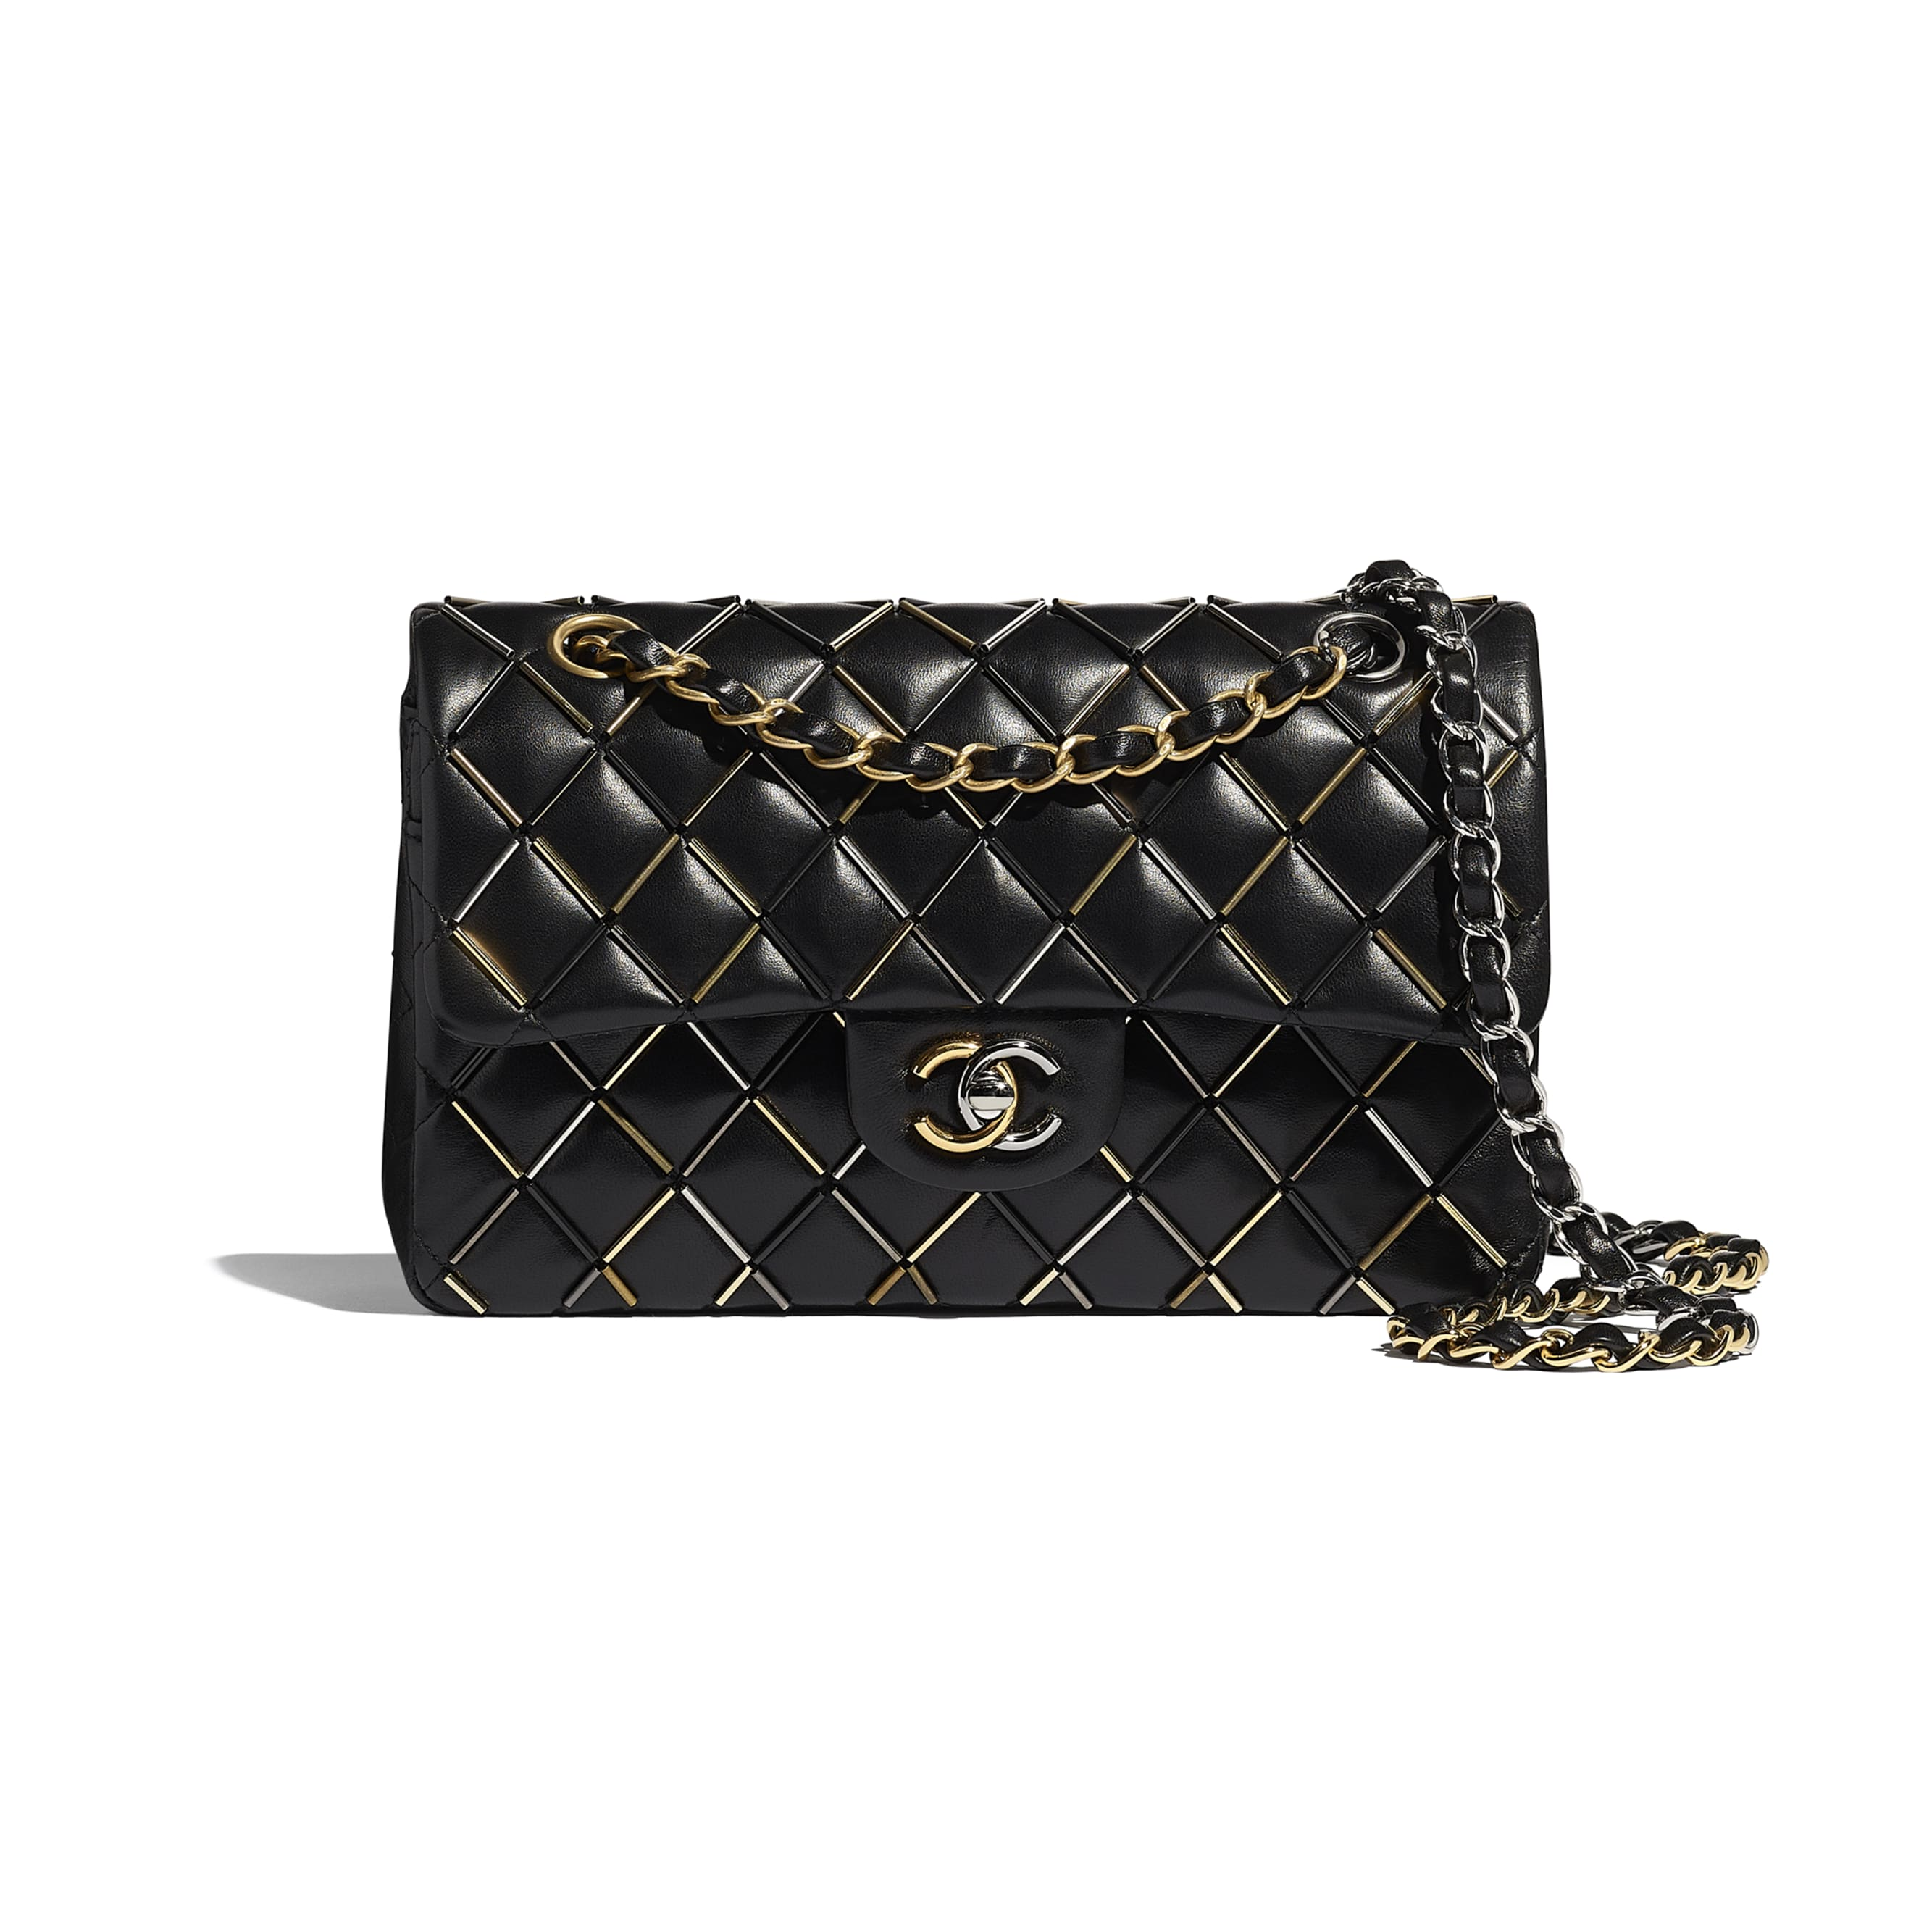 Classic Handbag - Black - Lambskin, Gold-Tone, Silver-Tone, Black & Ruthenium-Finish Metal - CHANEL - Default view - see standard sized version